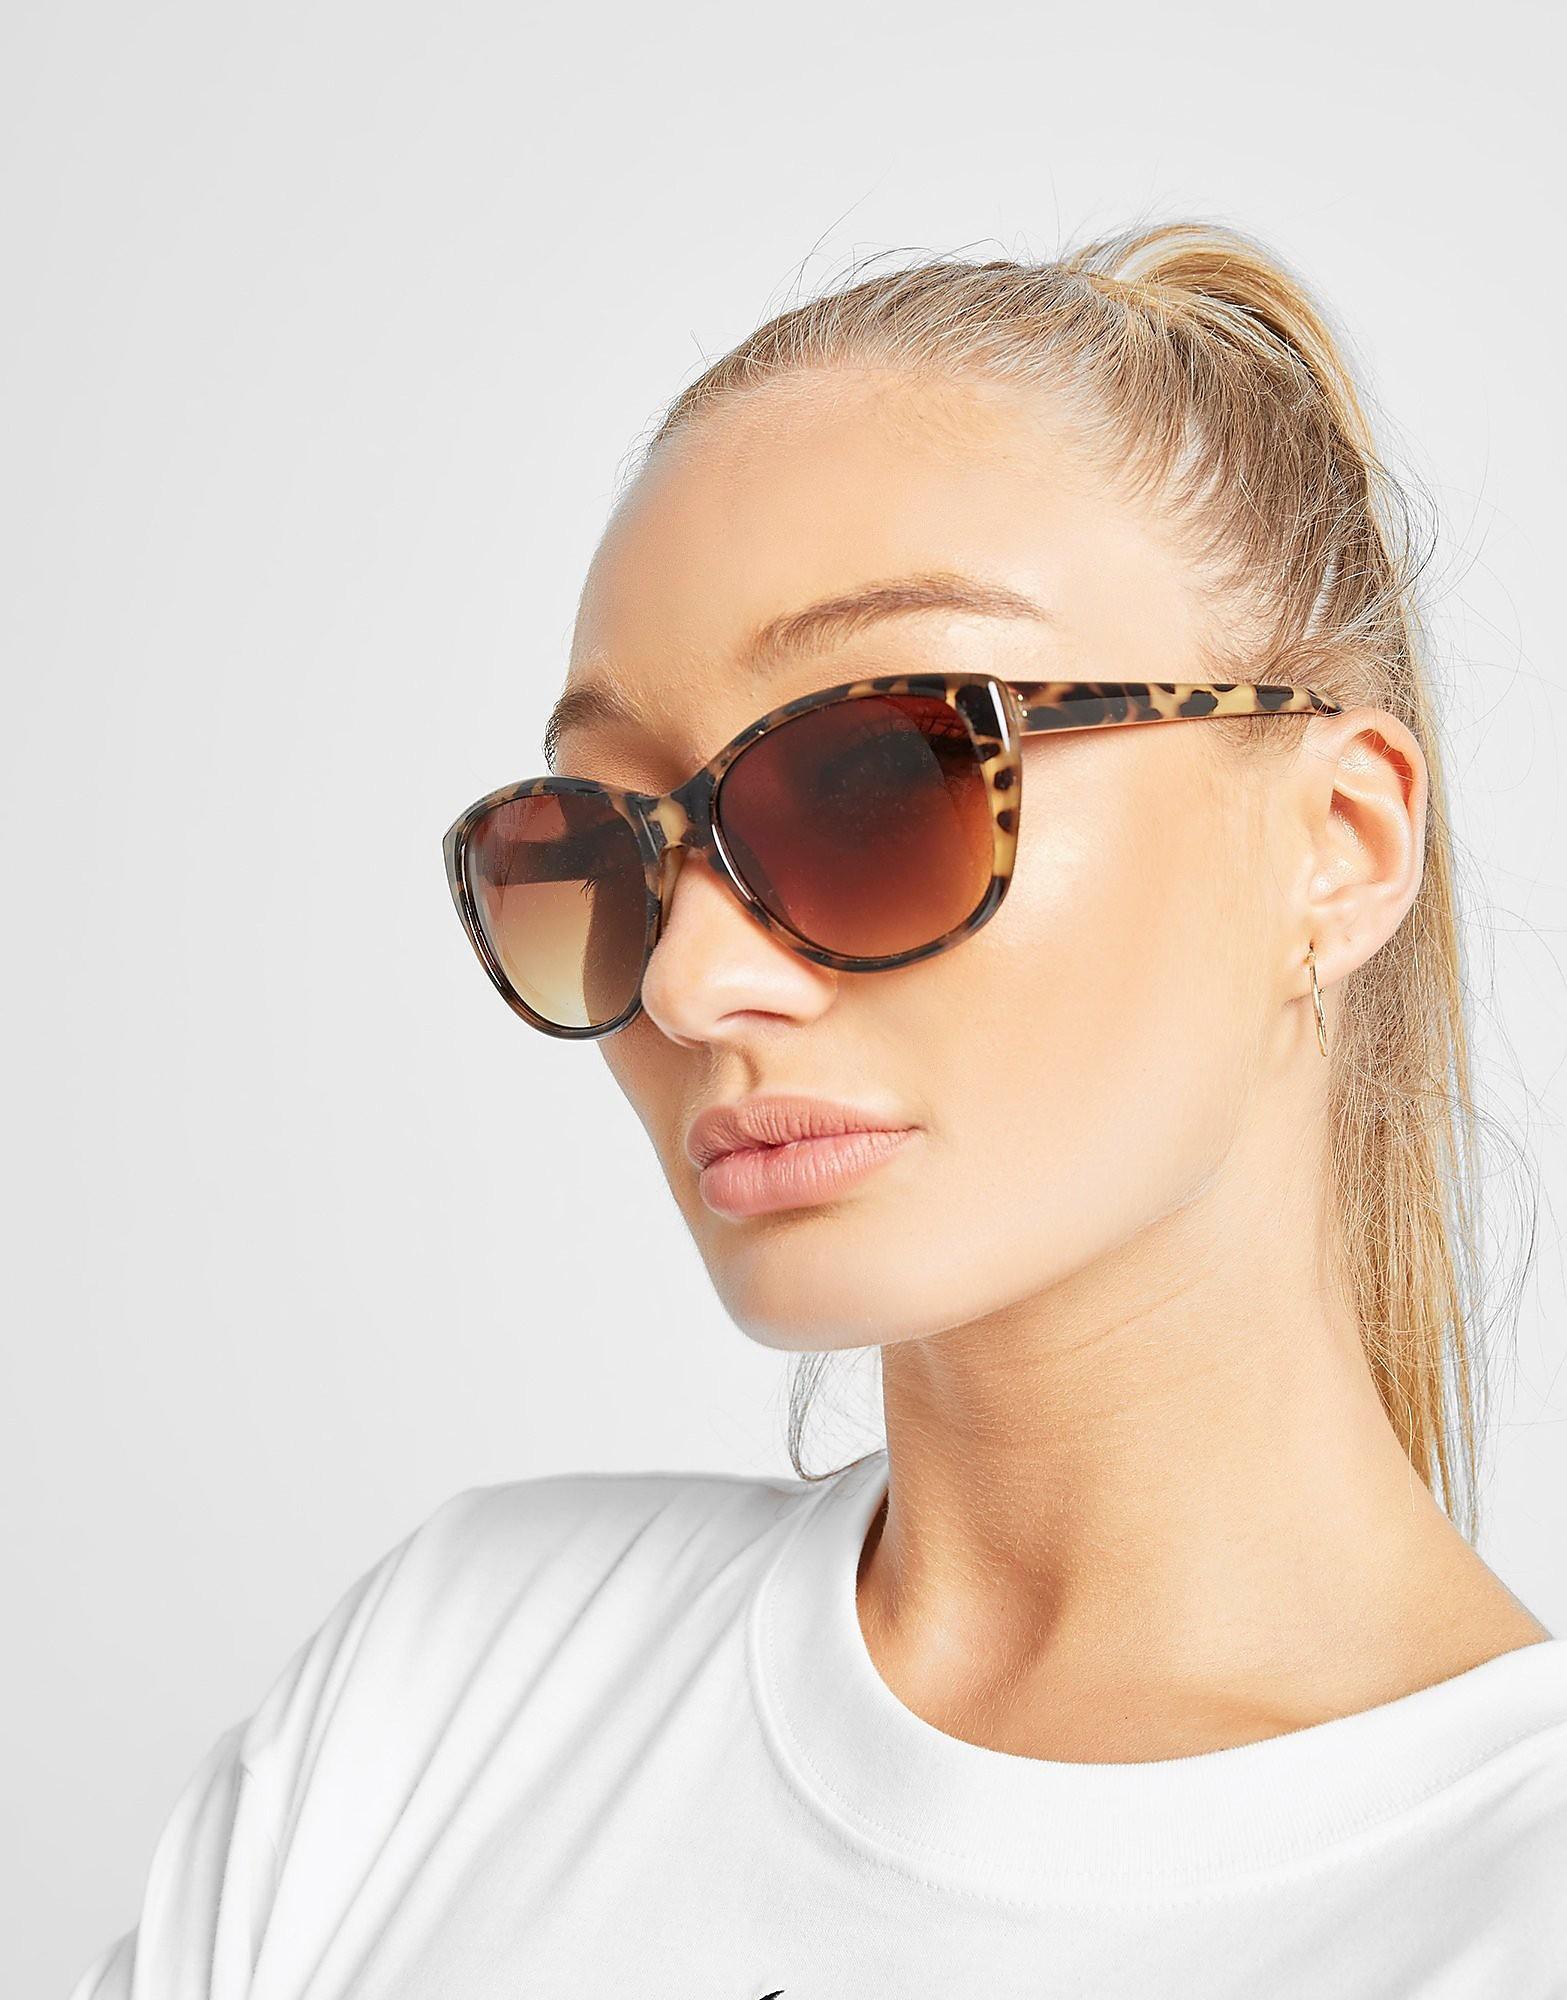 Brookhaven Gafas de sol Louise Butterfly Shaped